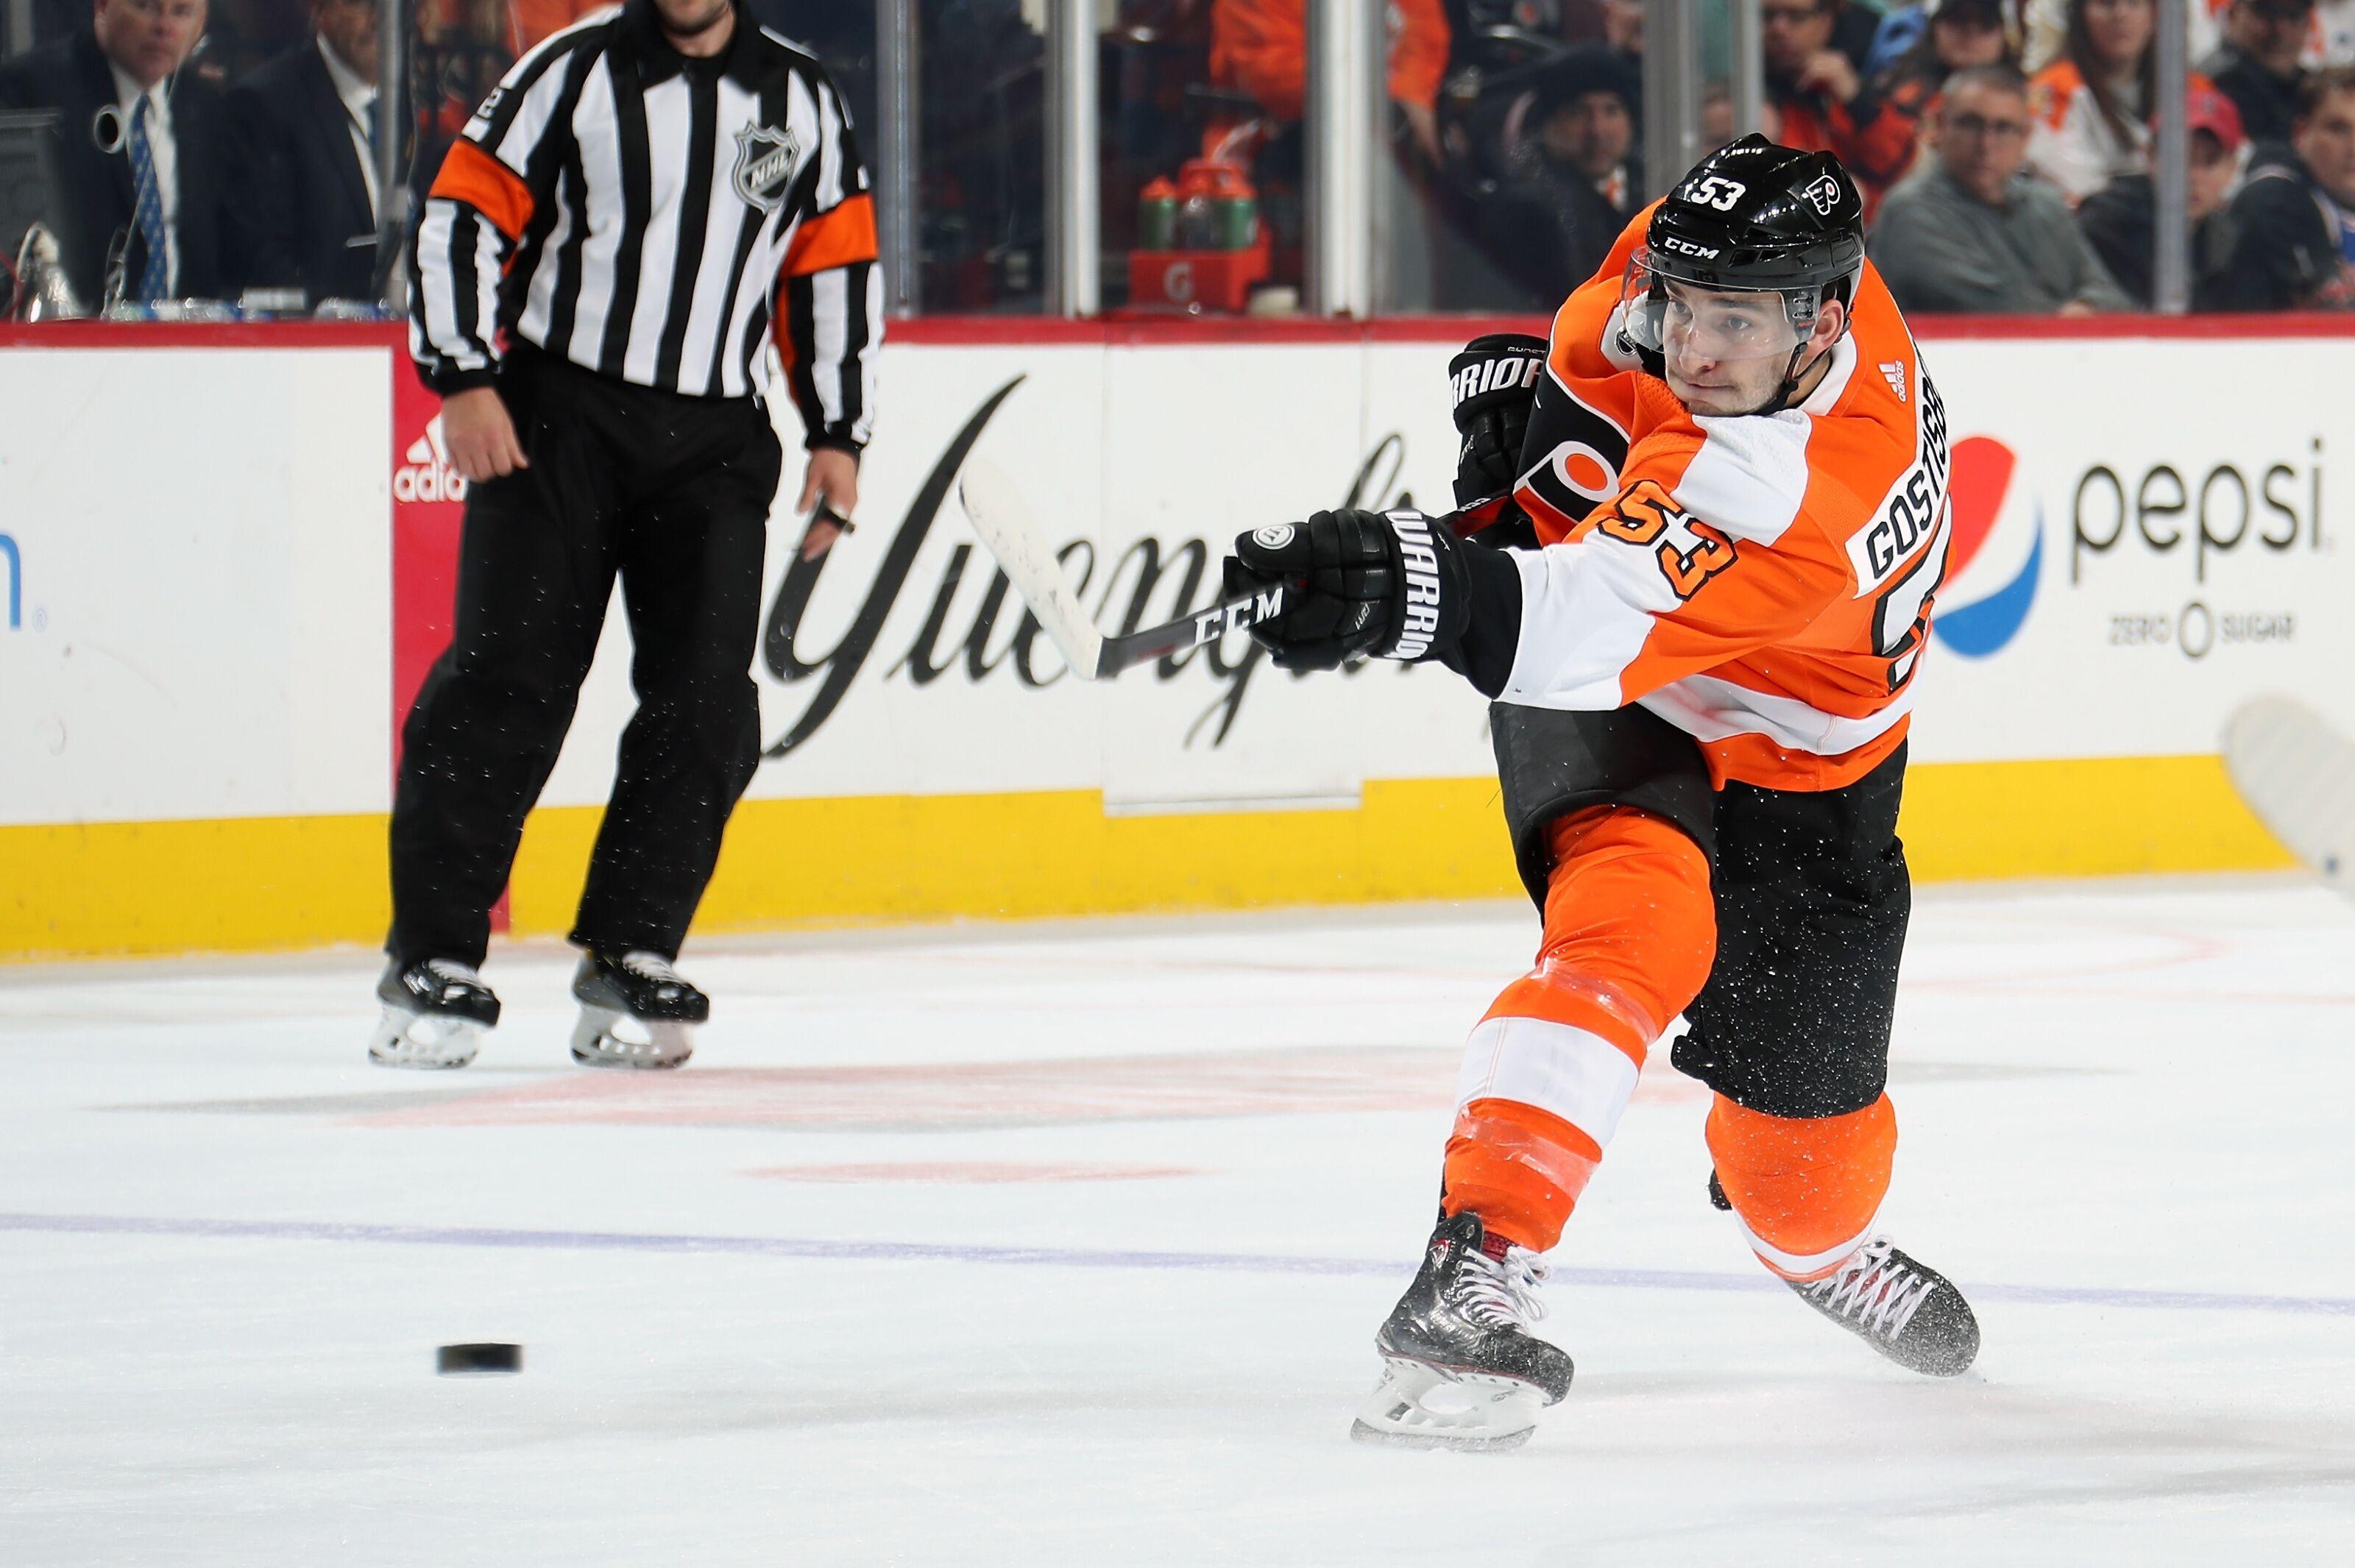 76f56c01c40 Gostisbehere scores OT winner as Philadelphia Flyers defeat Coyotes 5-4